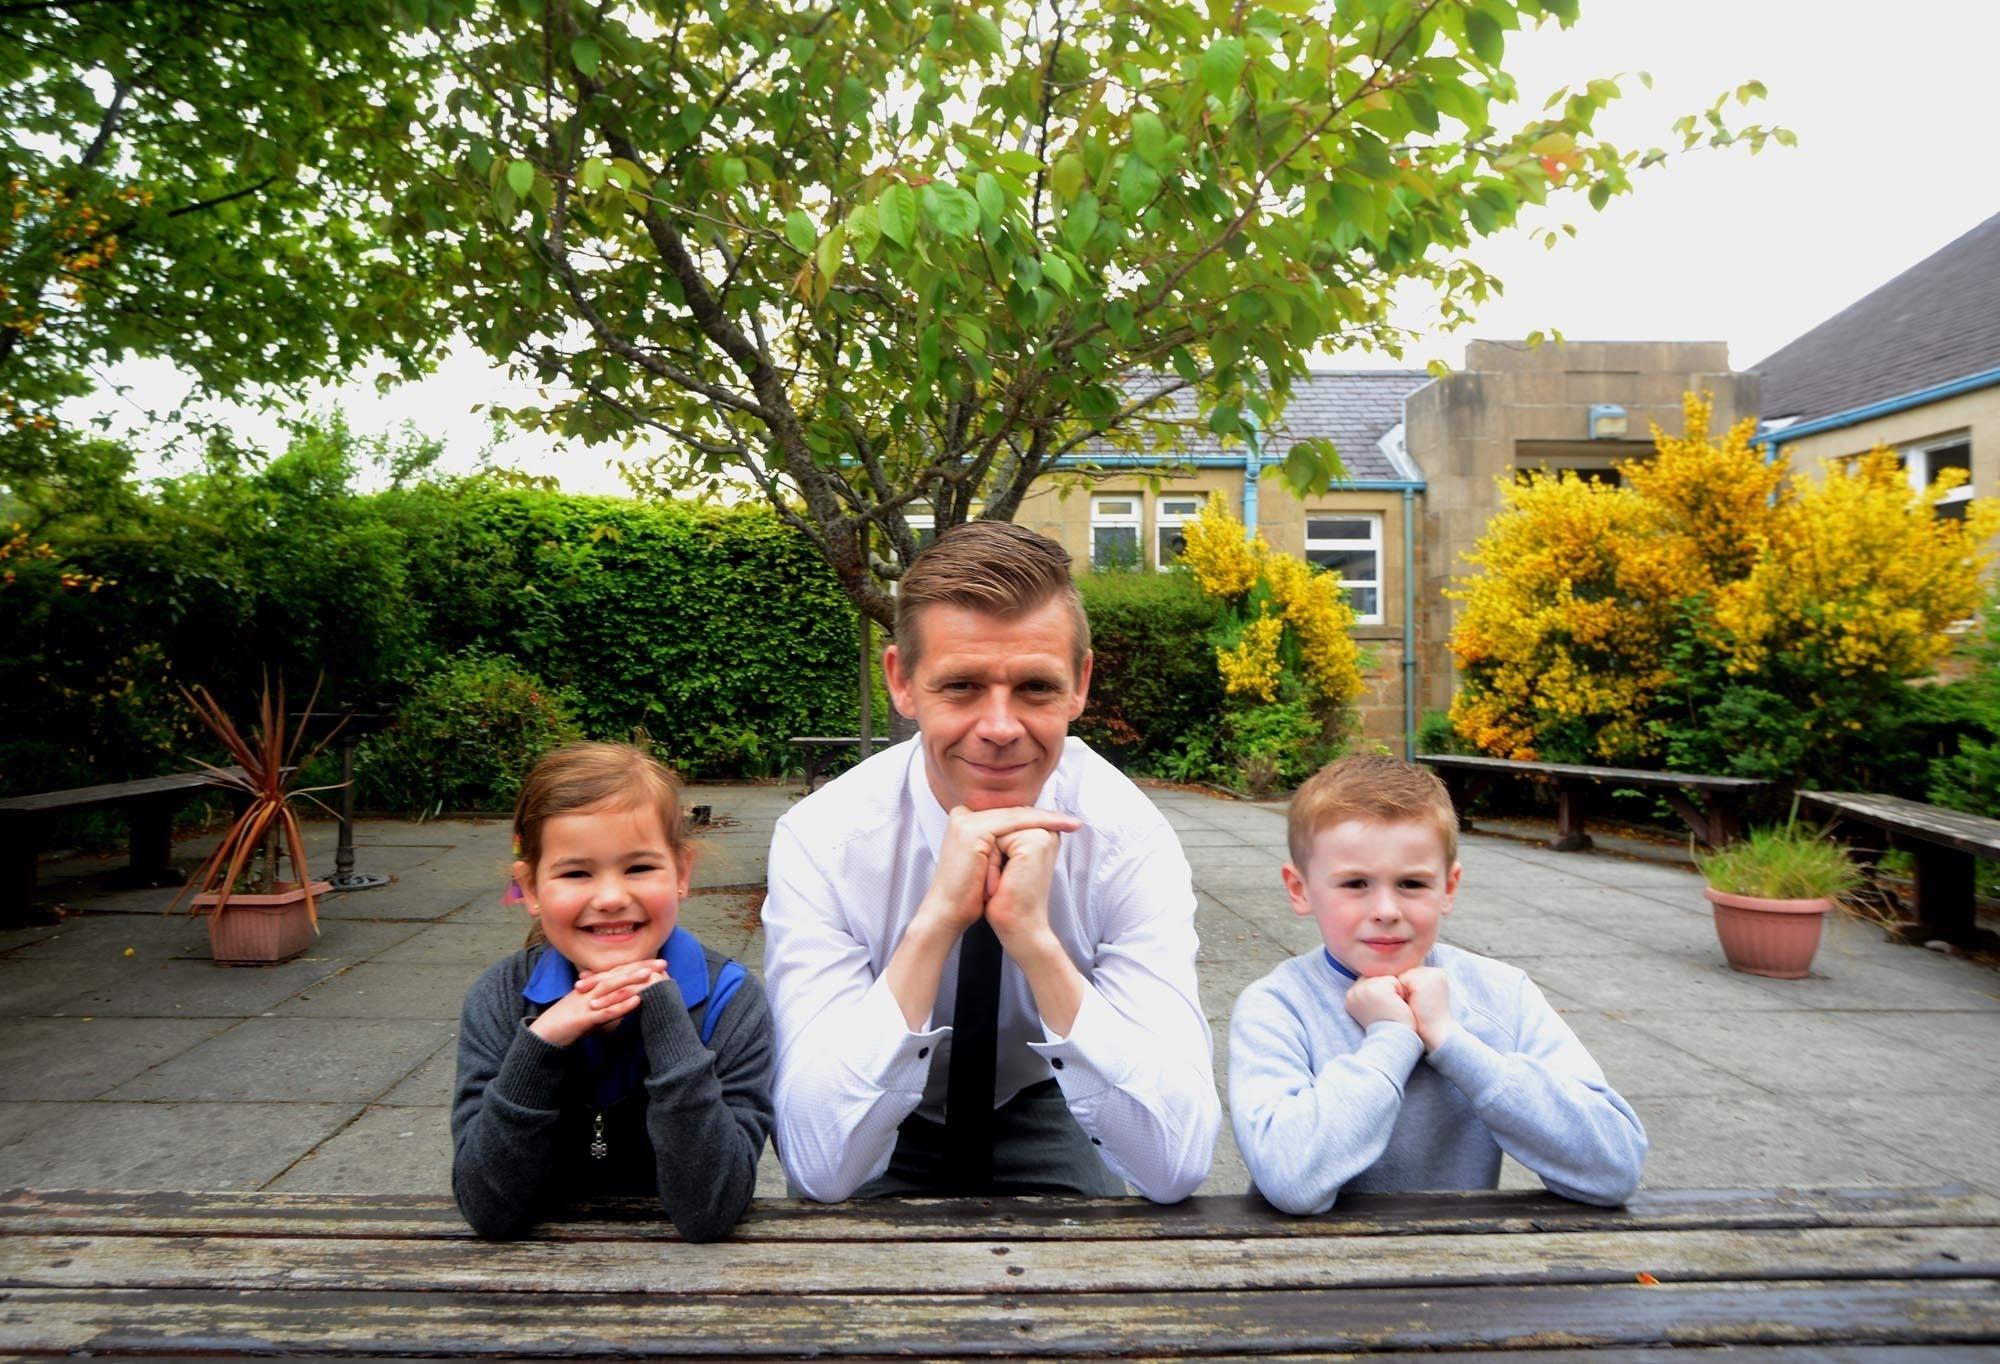 Kevin Stuart primary teacher,Staci Retson 5 and Finlay Mckenzie 6